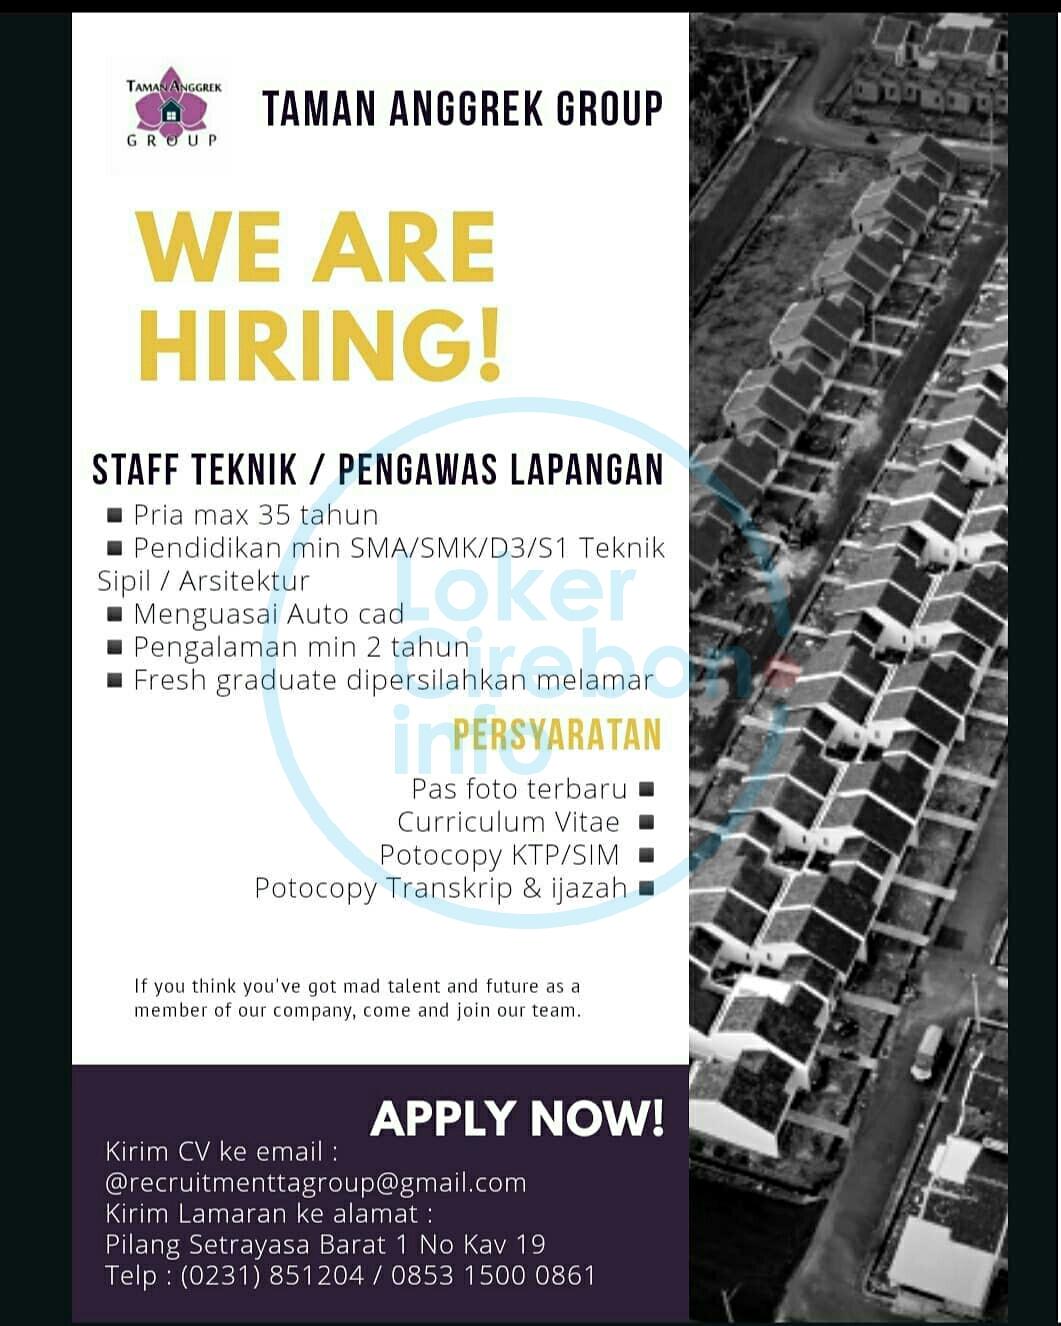 Lowongan Kerja Taman Anggrek Group Cirebon